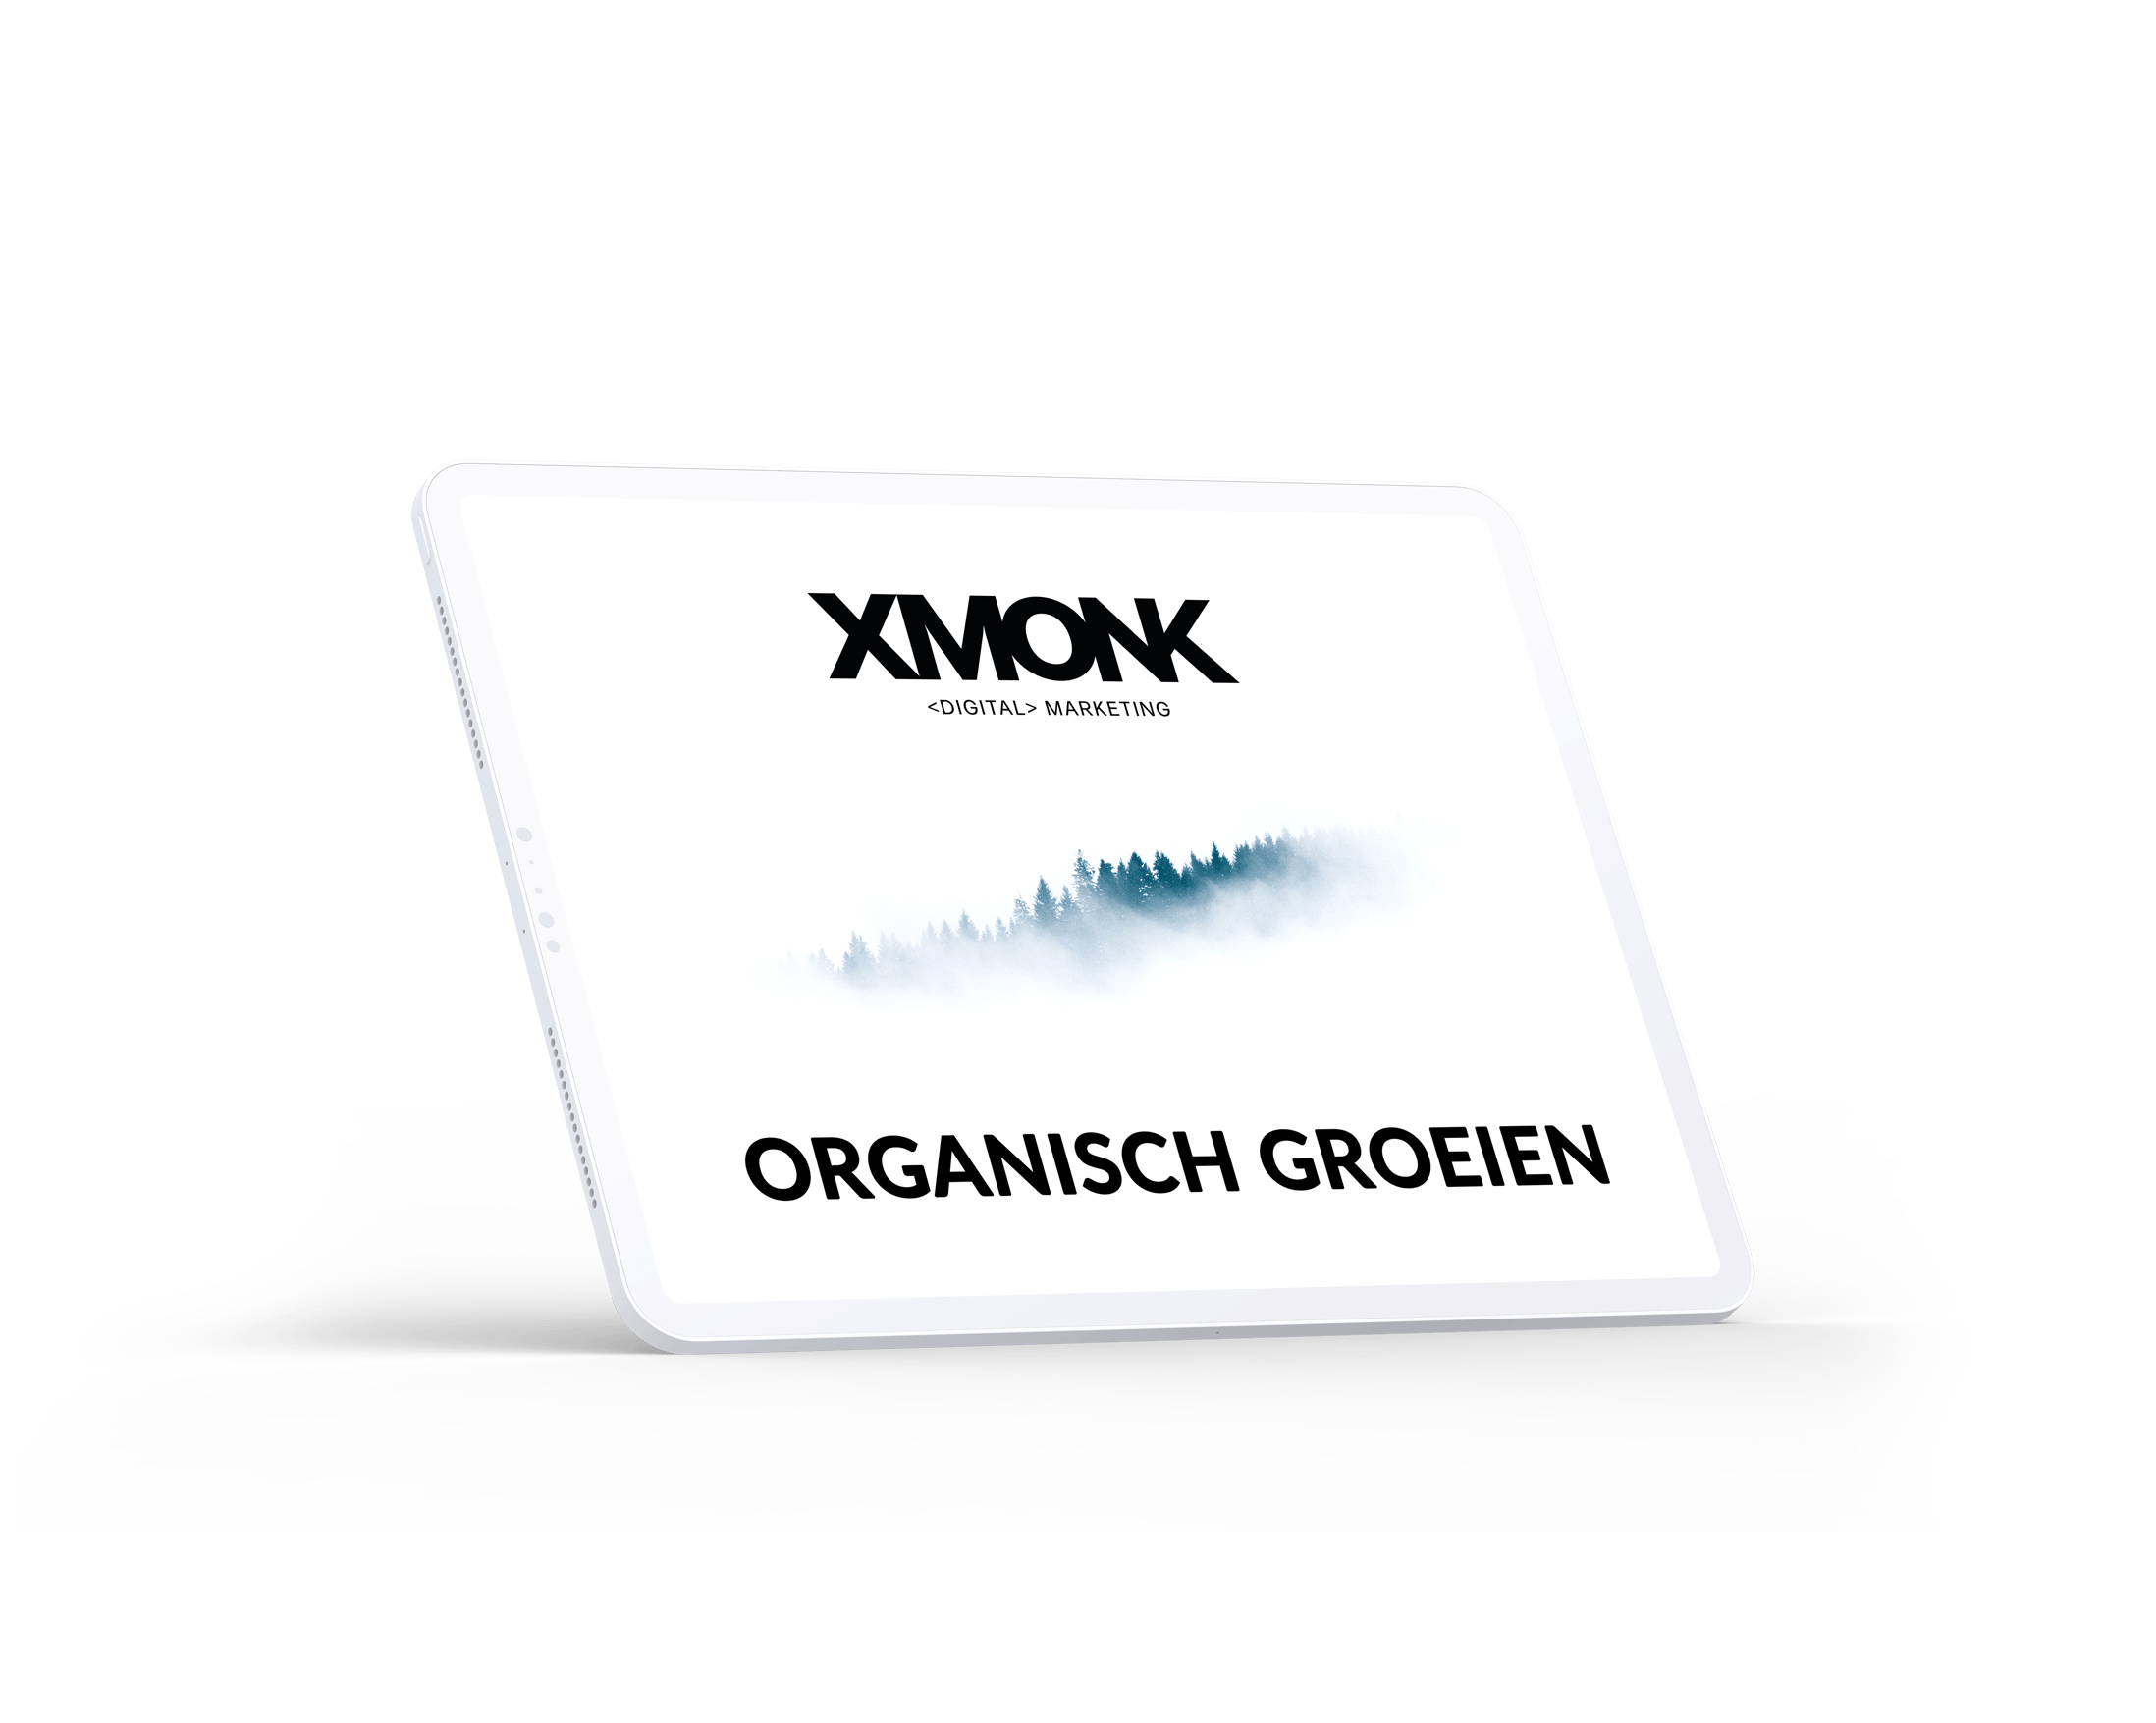 organischgroeien XMONK